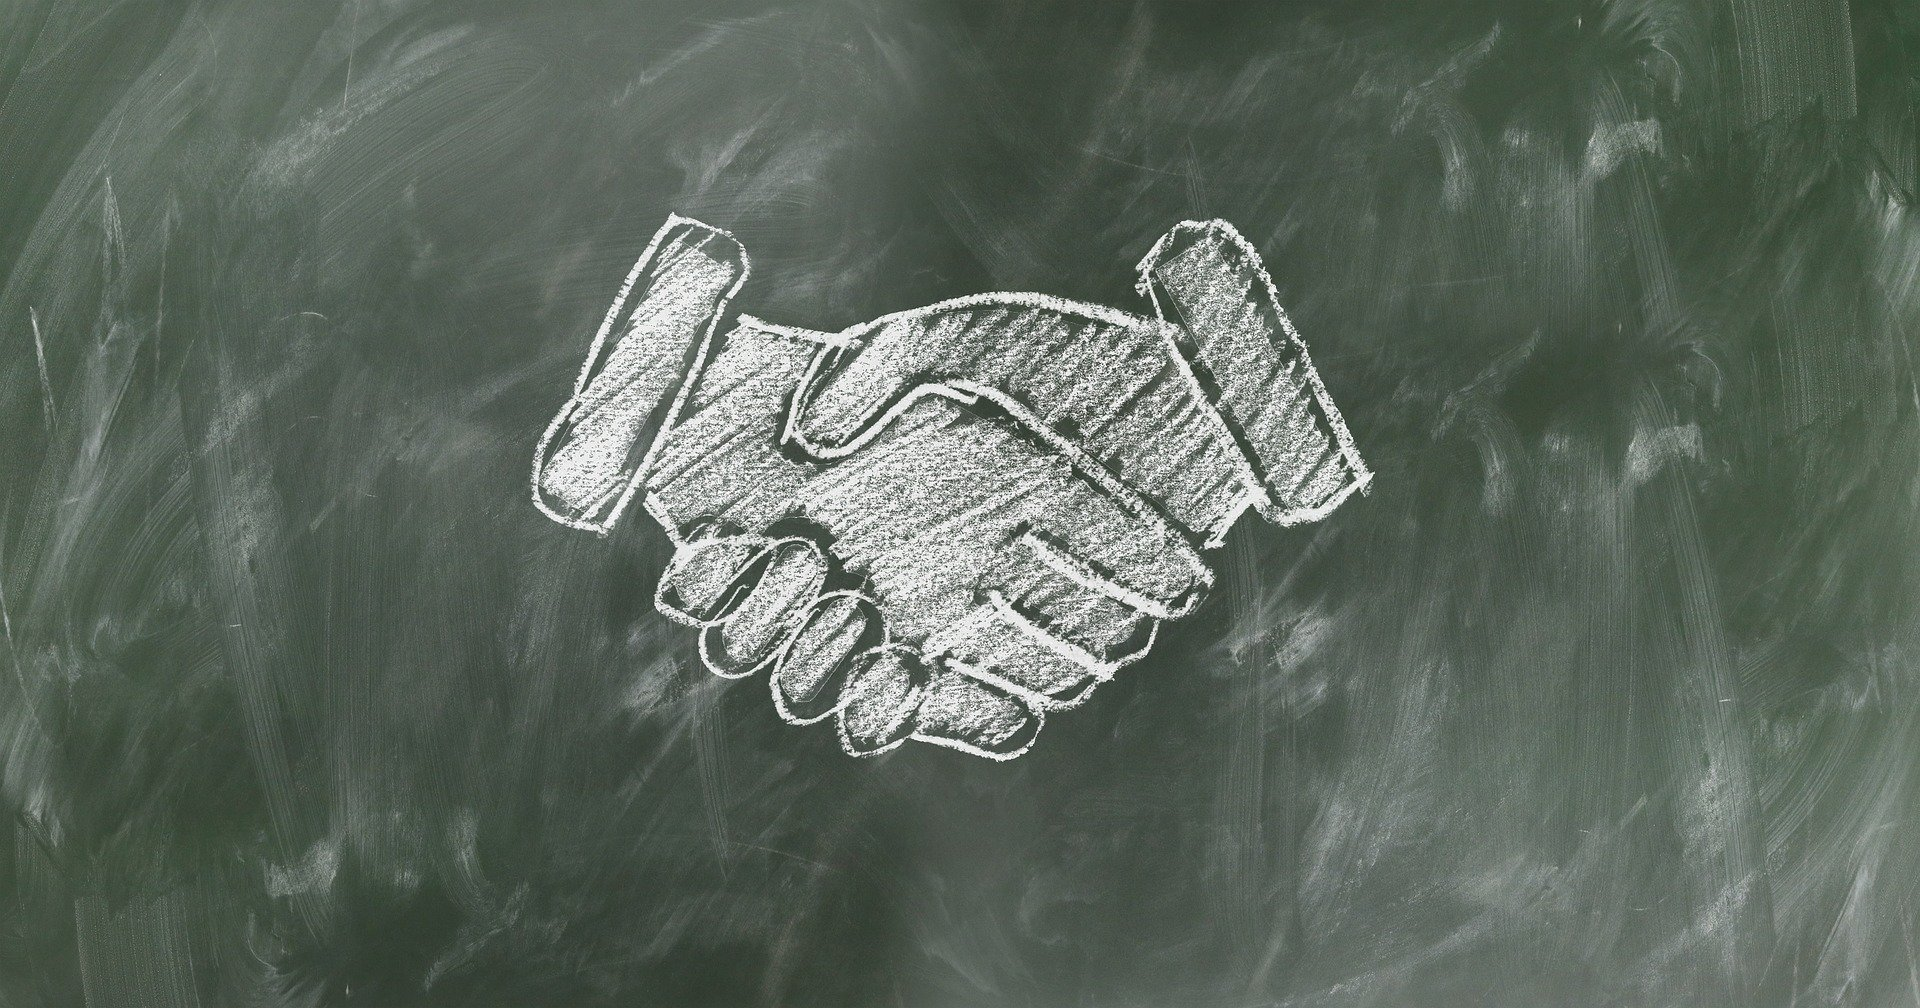 #enkeAnnounce: Partnership with Foondamate